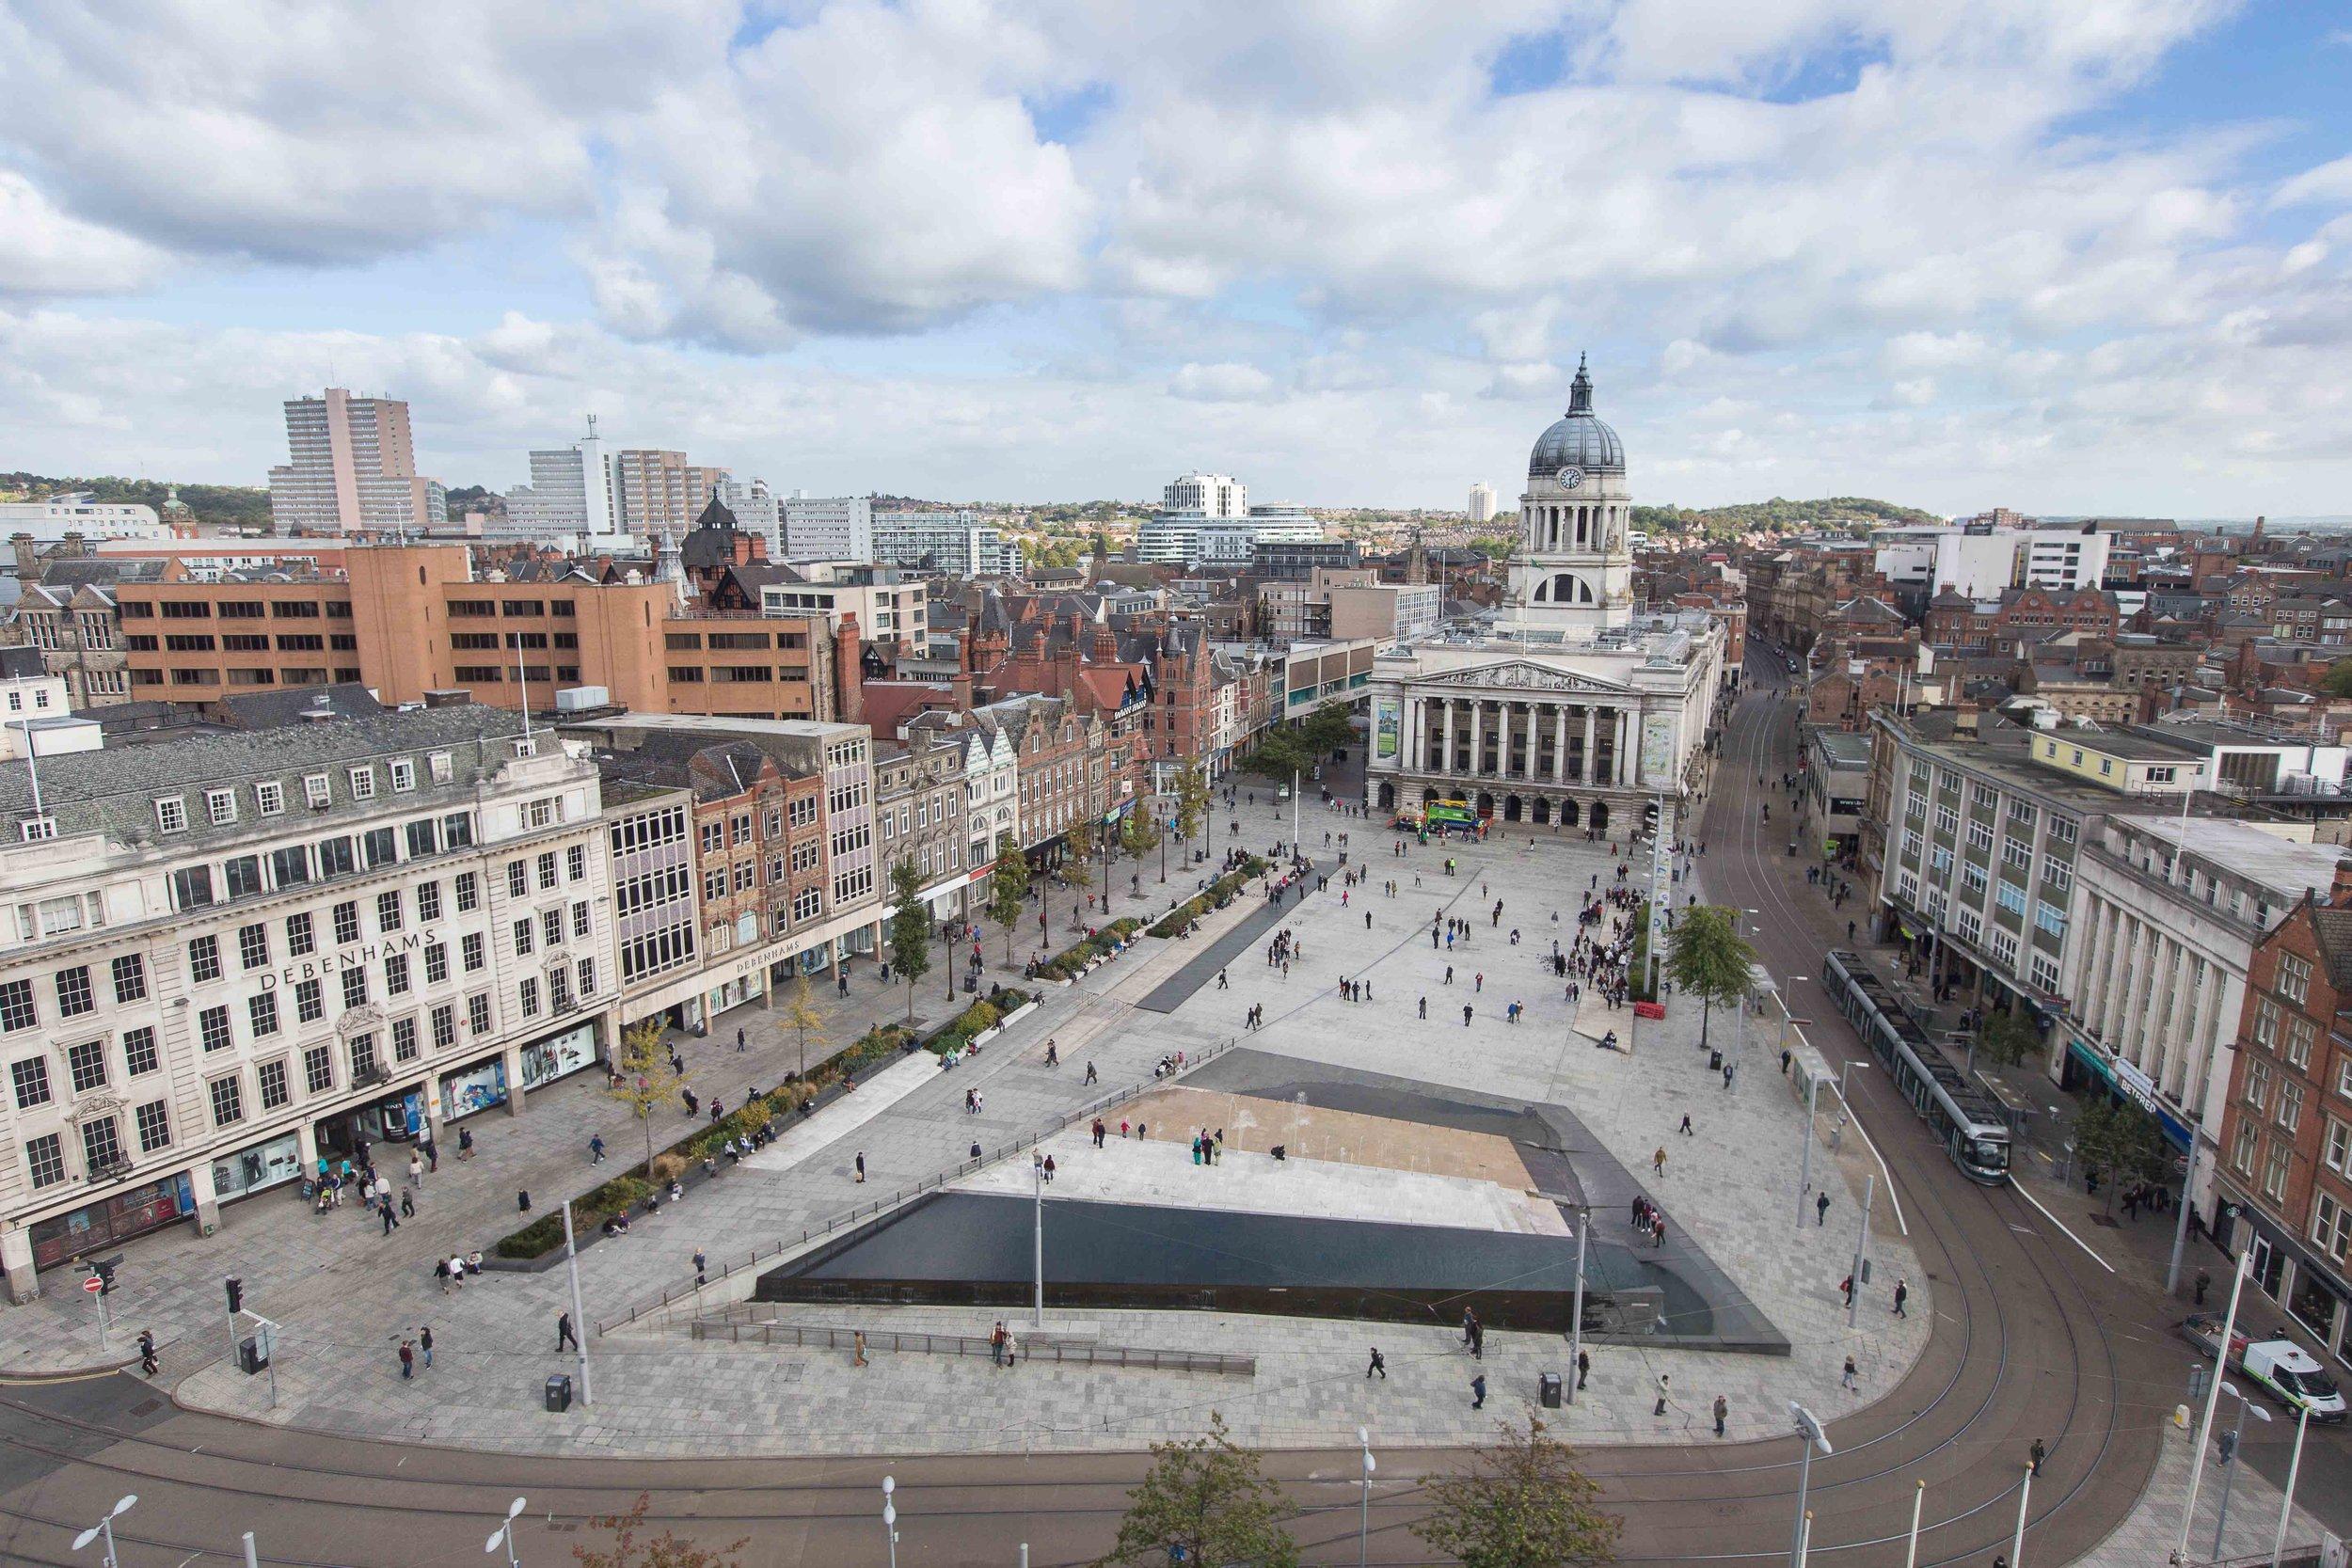 Old Market Square 2005-2007